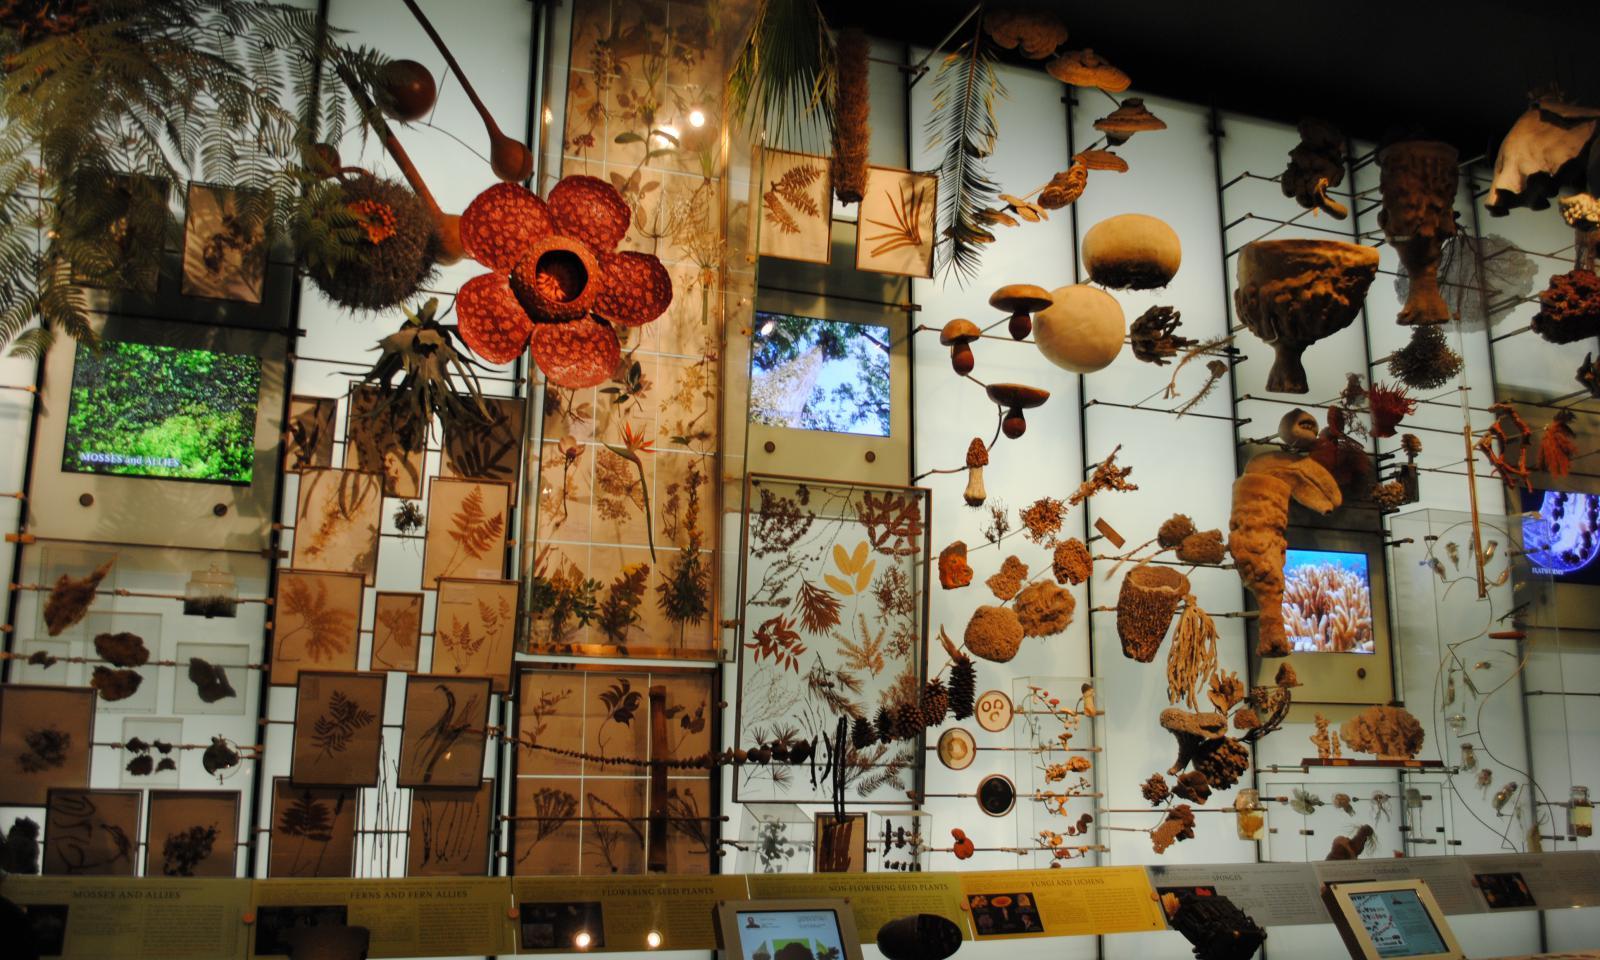 museo amerciano de historia natural (